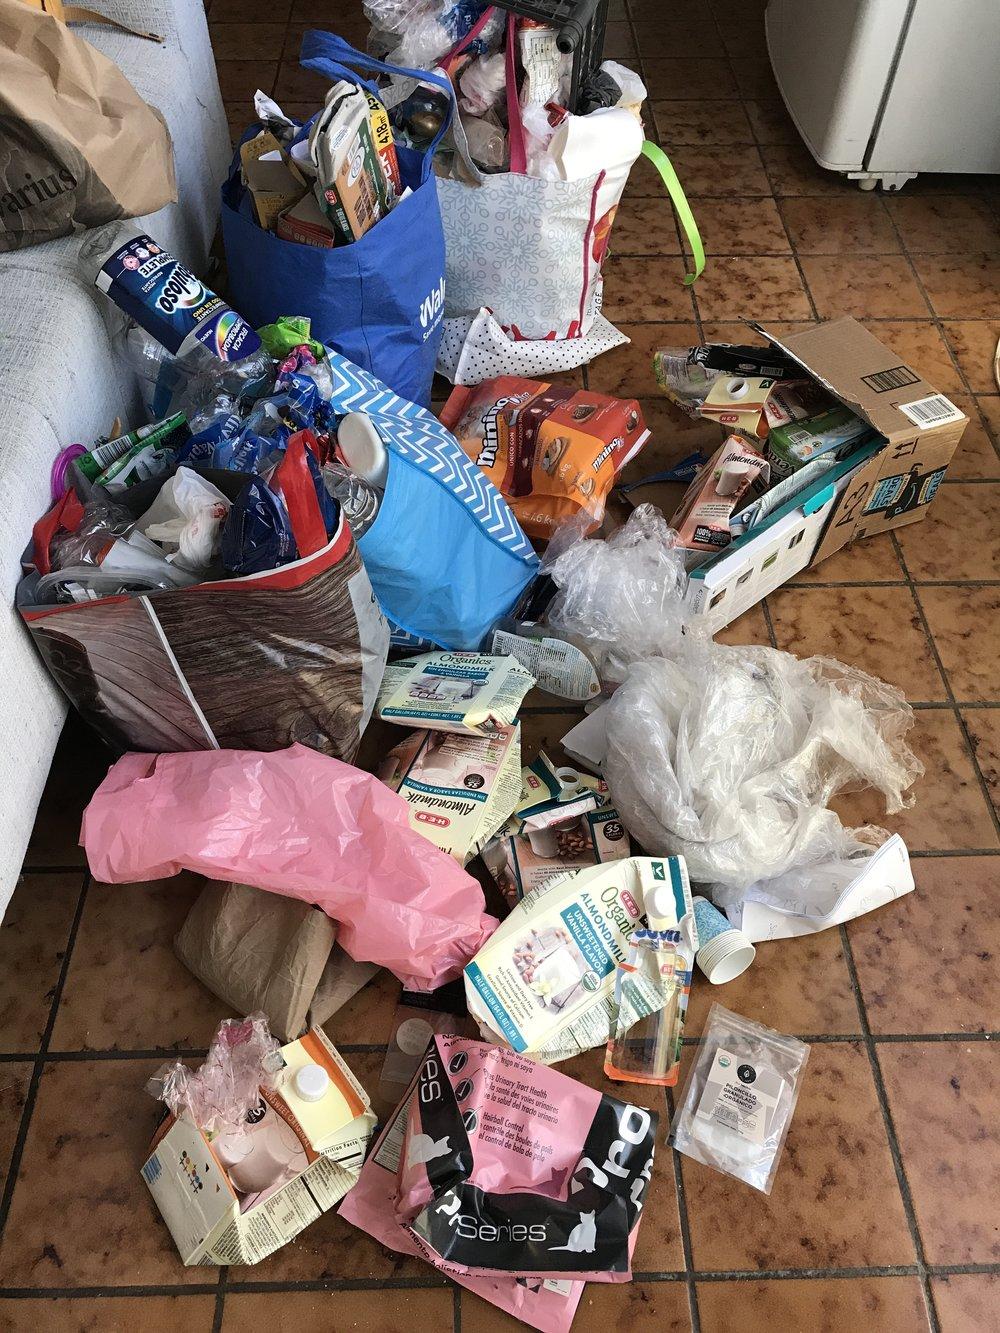 basura reciclar